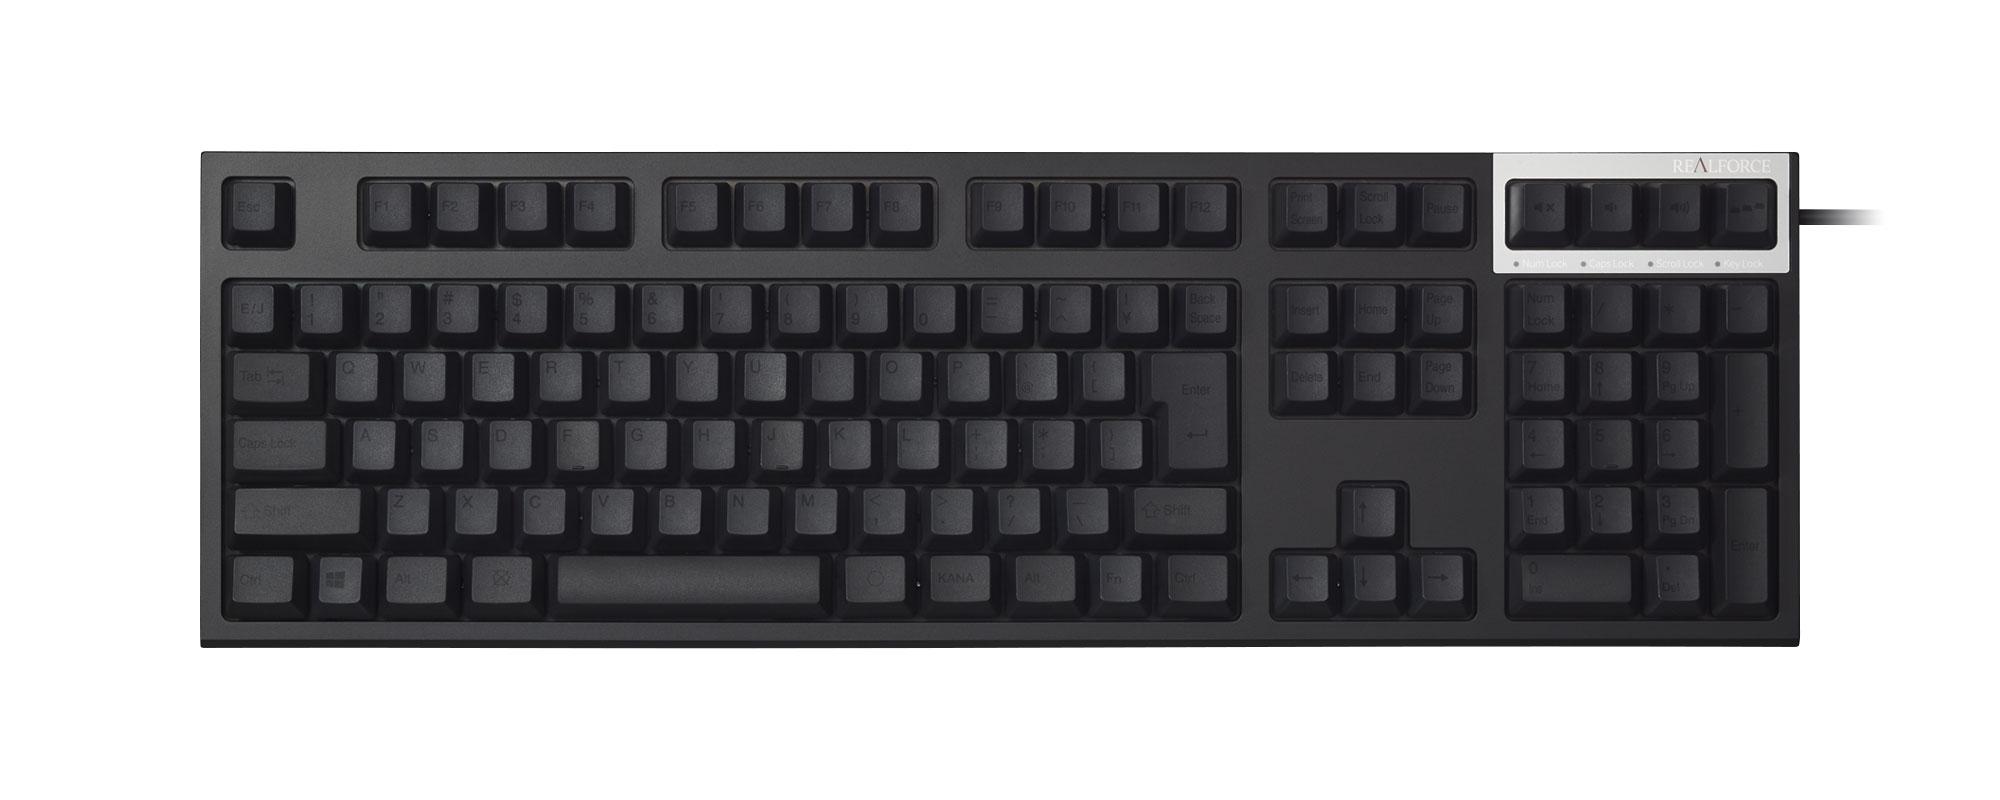 Mac用の第2世代REALFORCEキーボードが登場